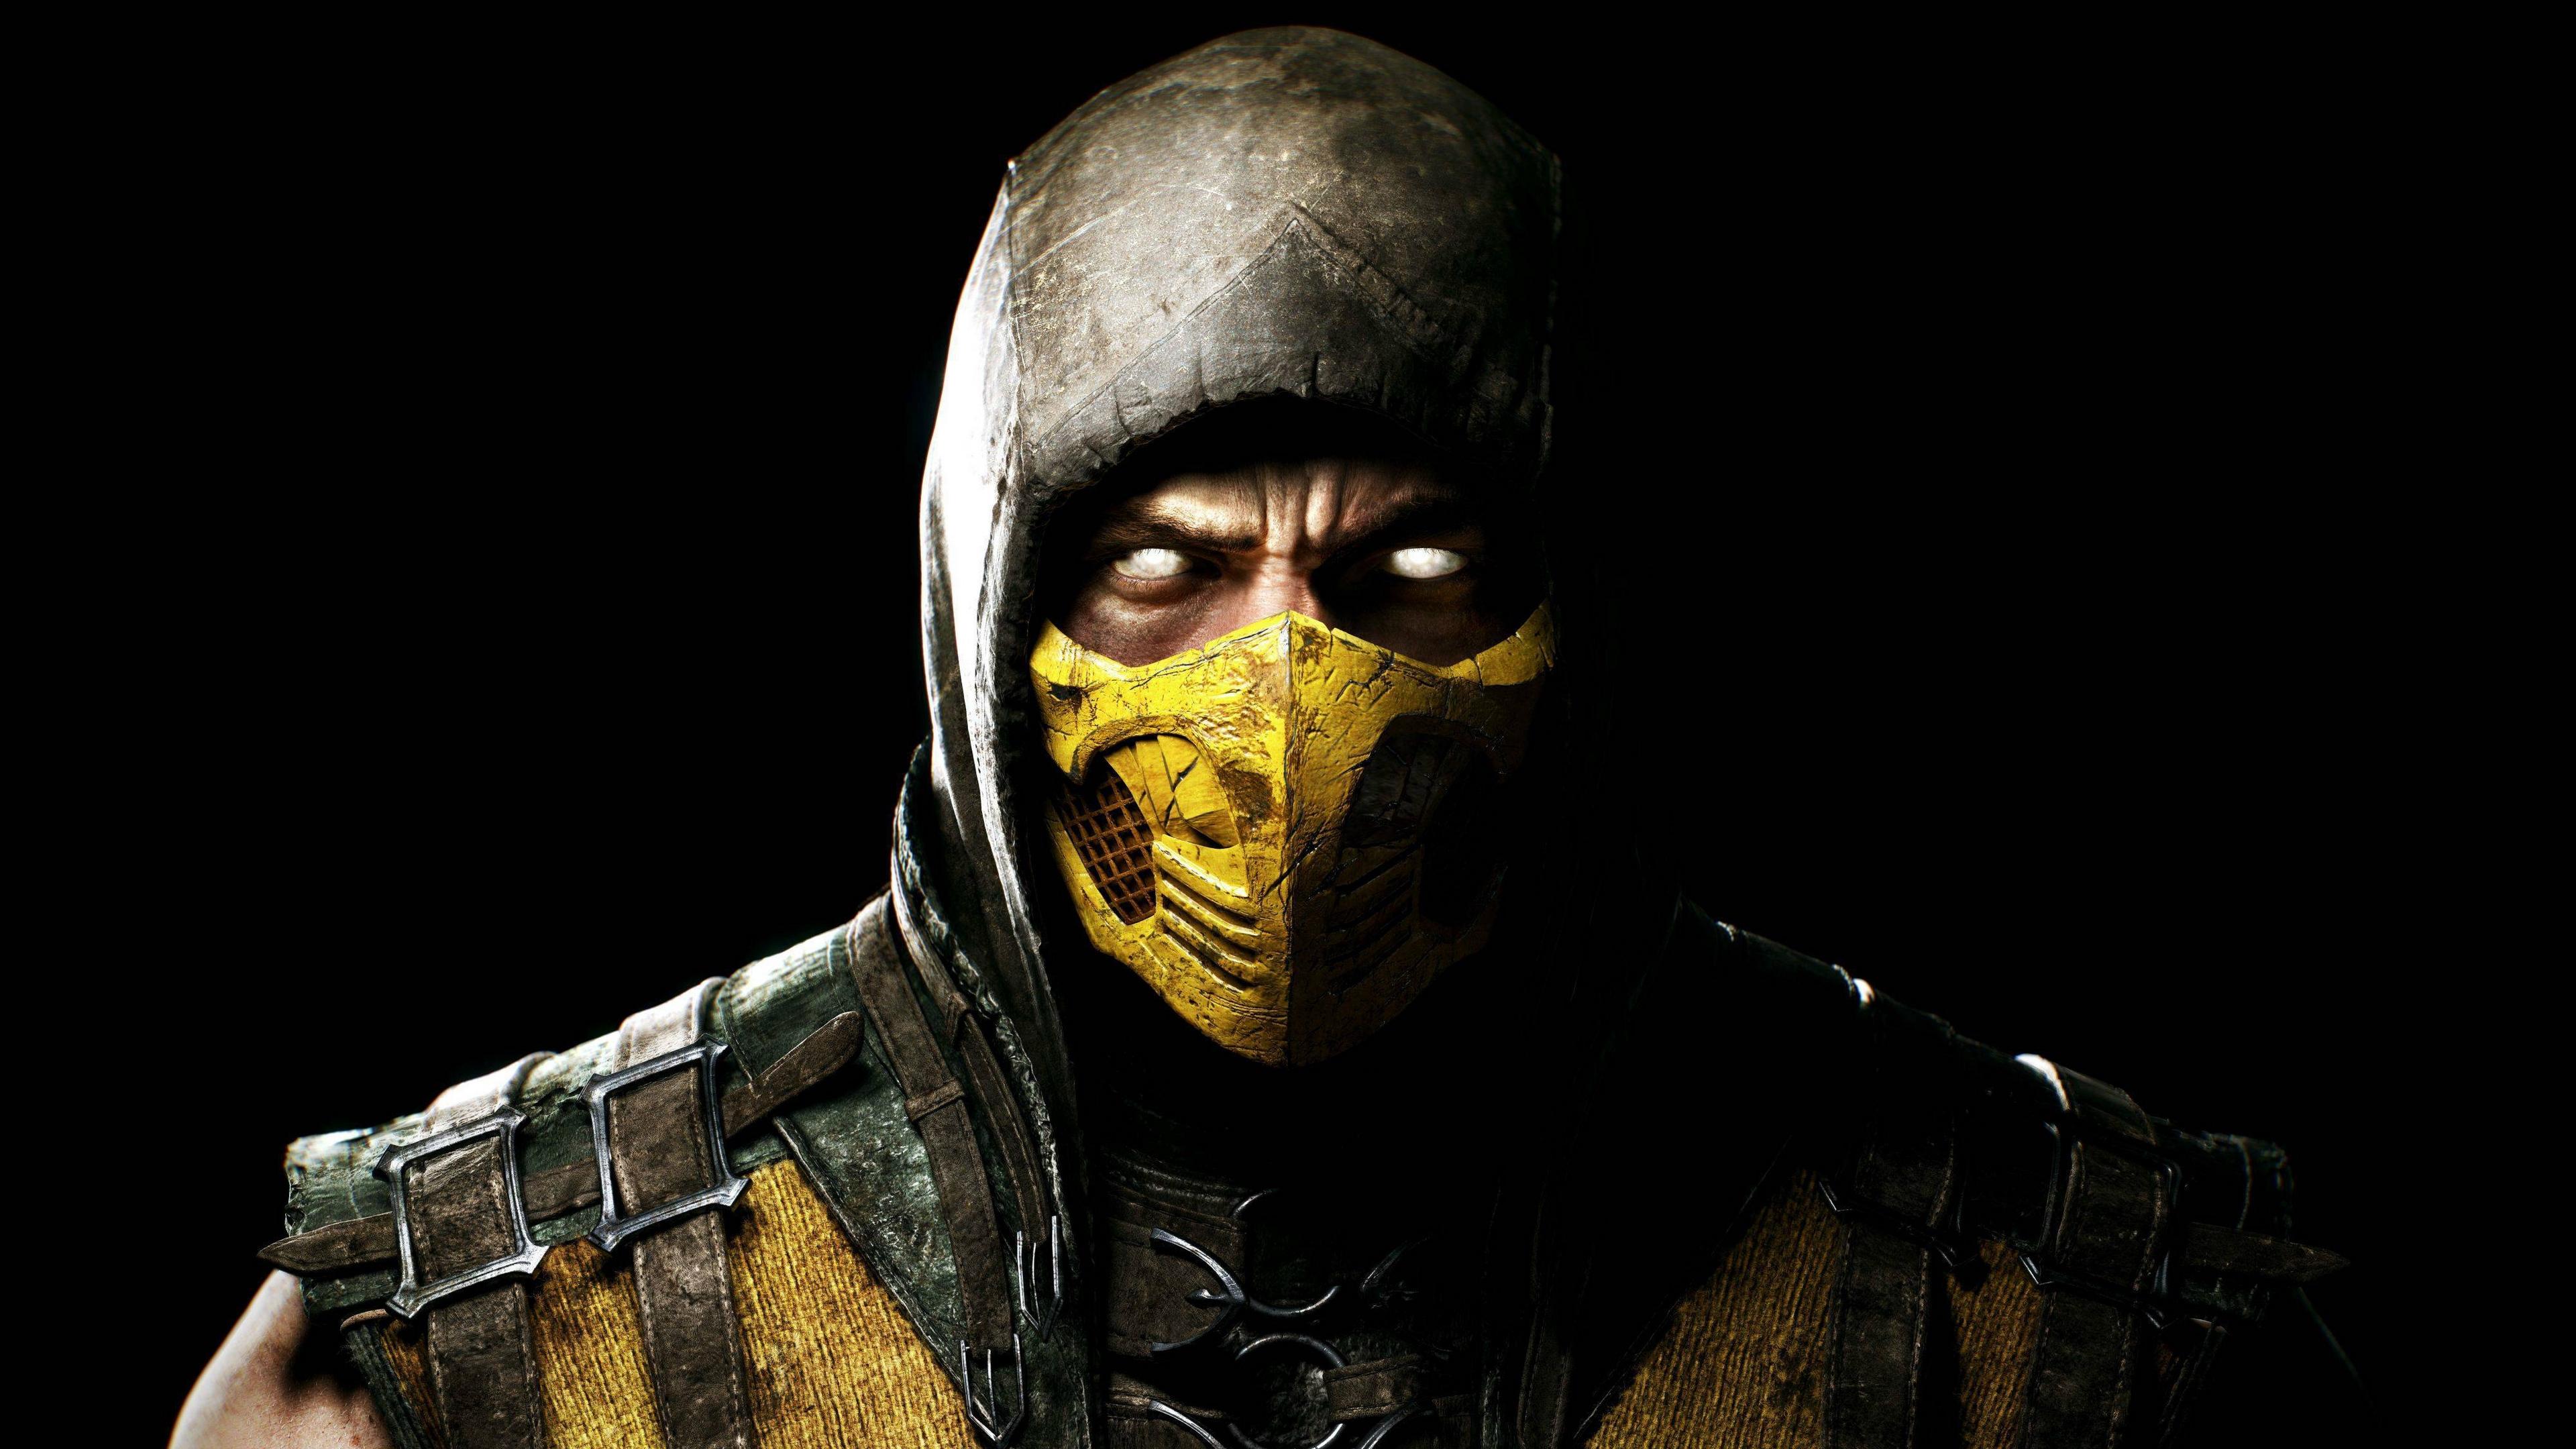 mortal kombat x scorpio ninja mask 4k 1538945038 - mortal kombat x, scorpio, ninja, mask 4k - Scorpio, Ninja, mortal kombat x